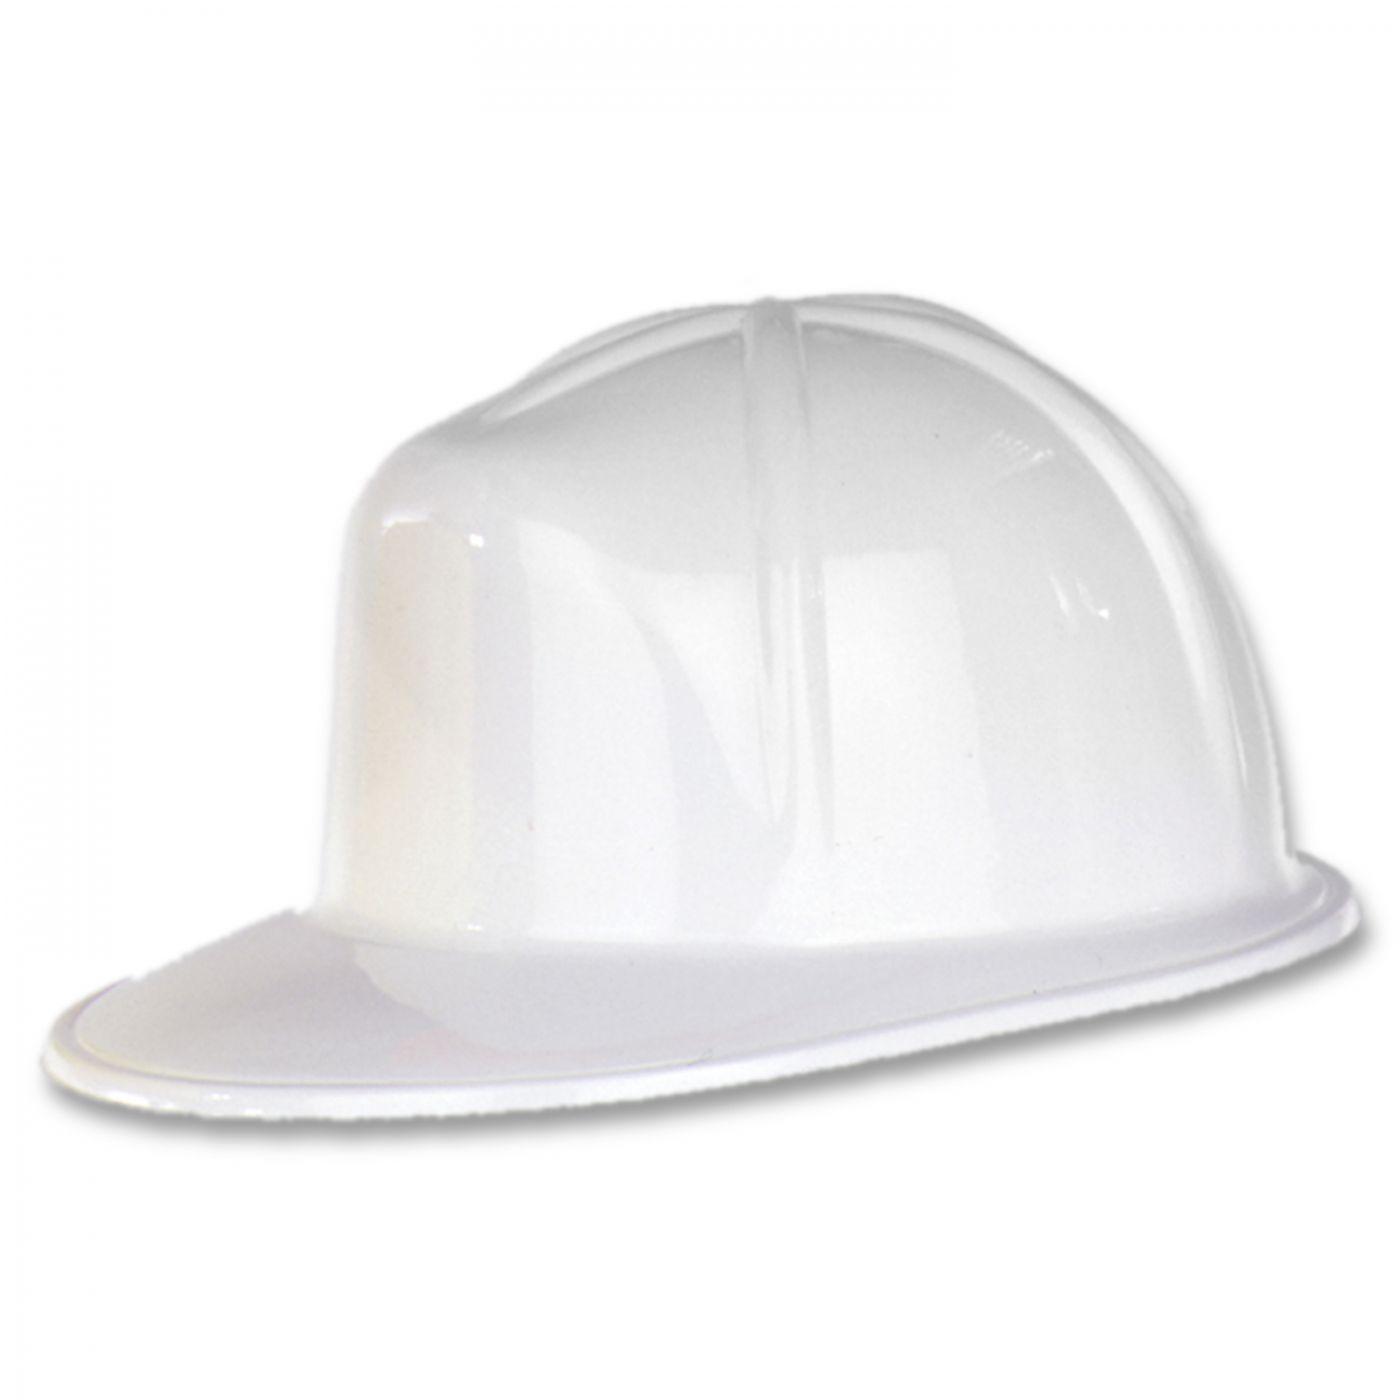 White Plastic Construction Helmet (48) image